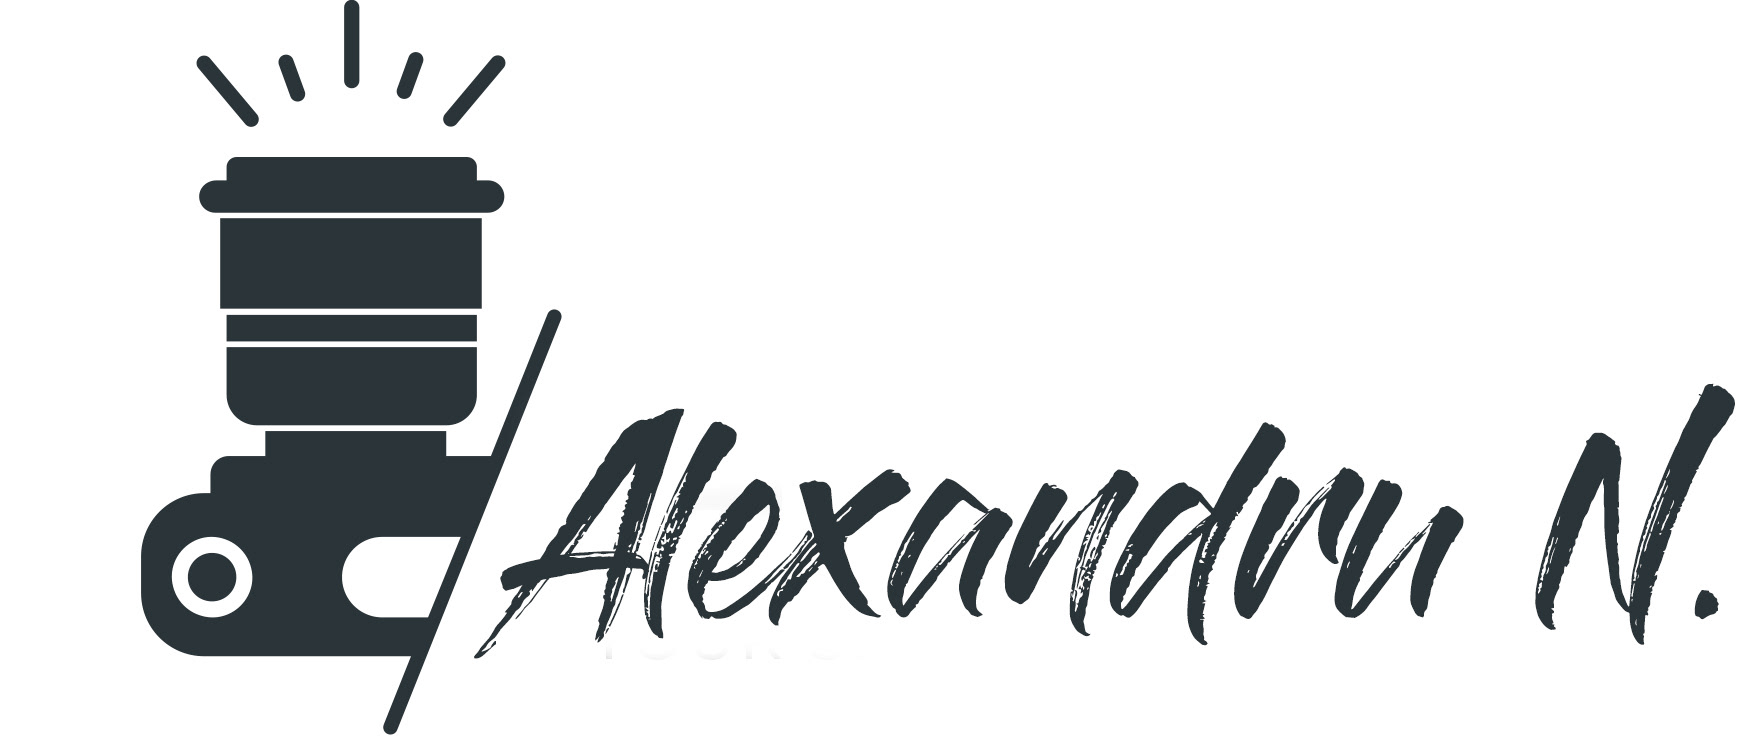 Alexandru Neacsu